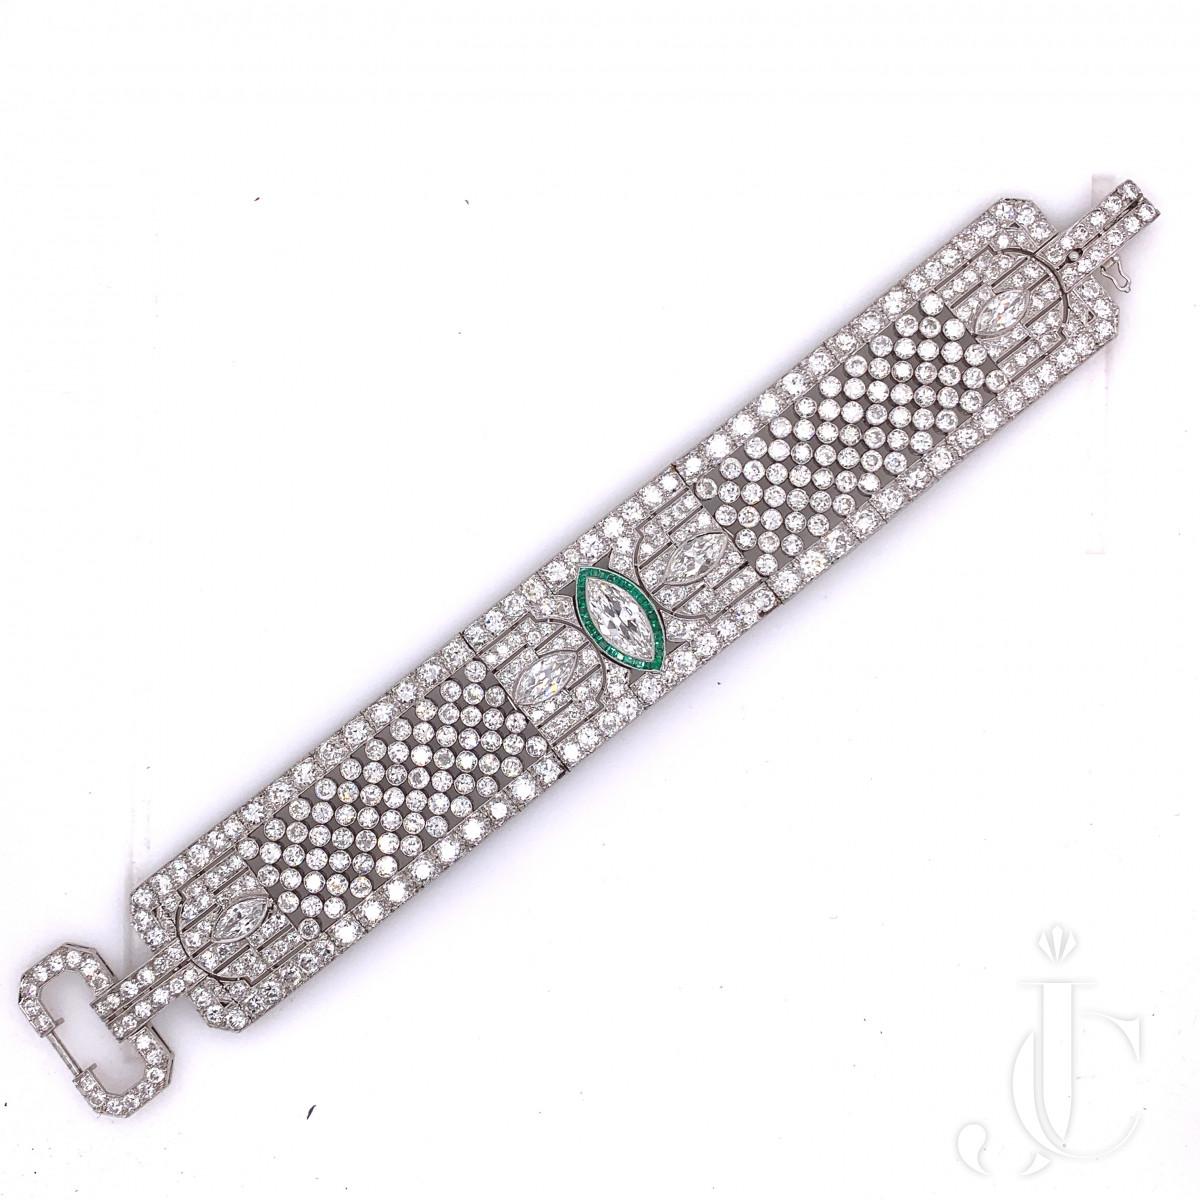 A platinum diamond and emerald bracelet